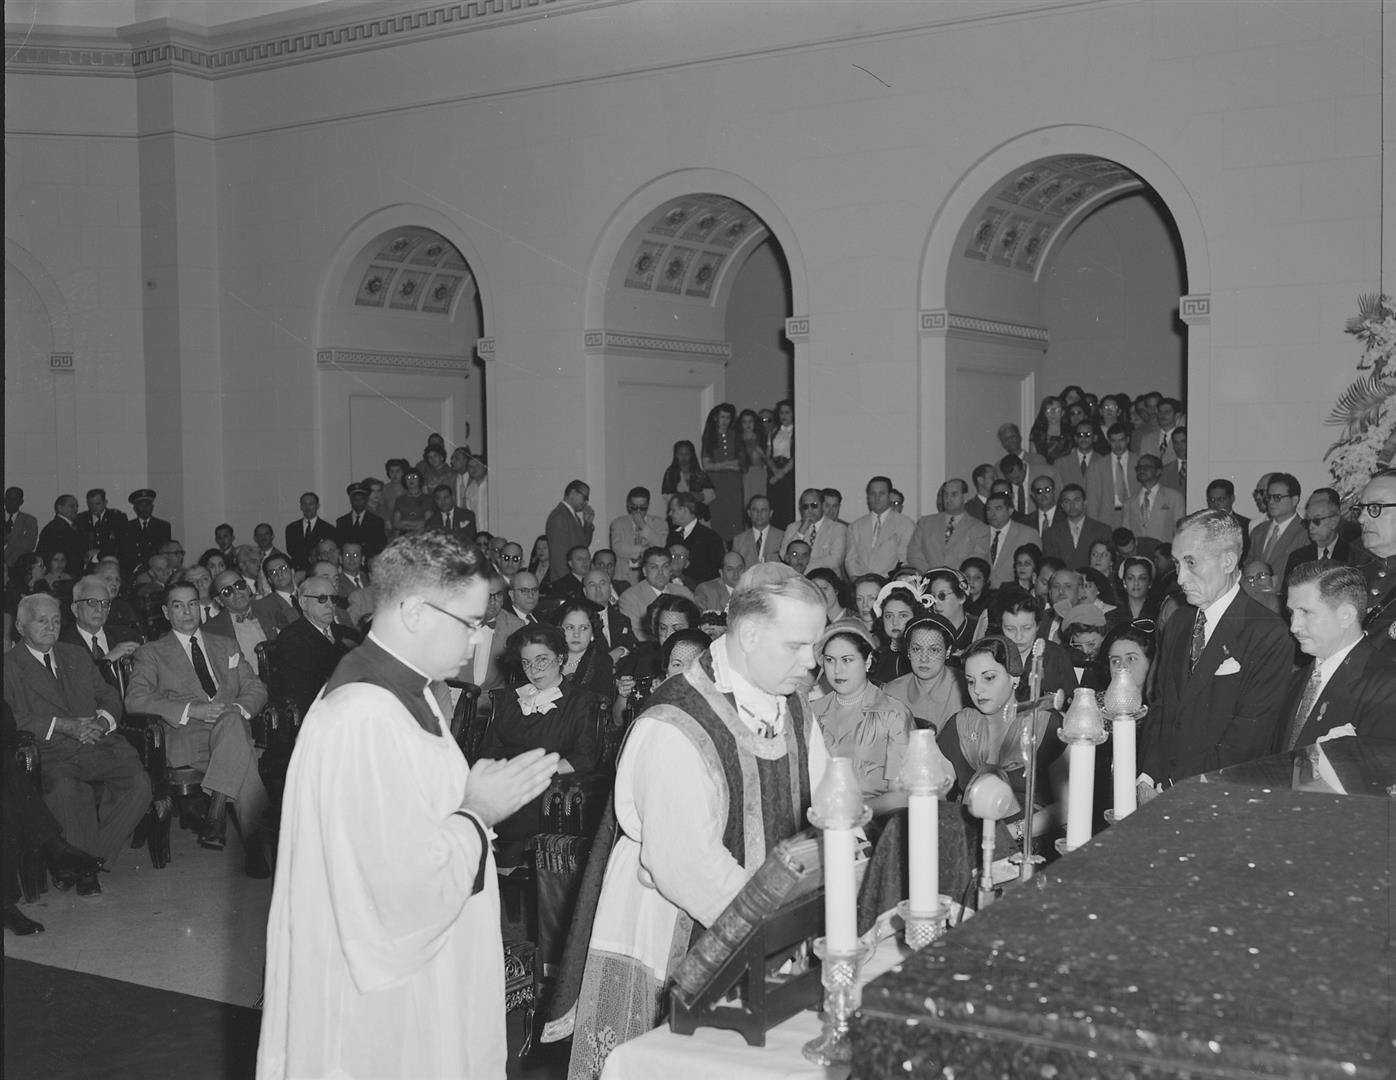 8. Acto Céspedes 1953